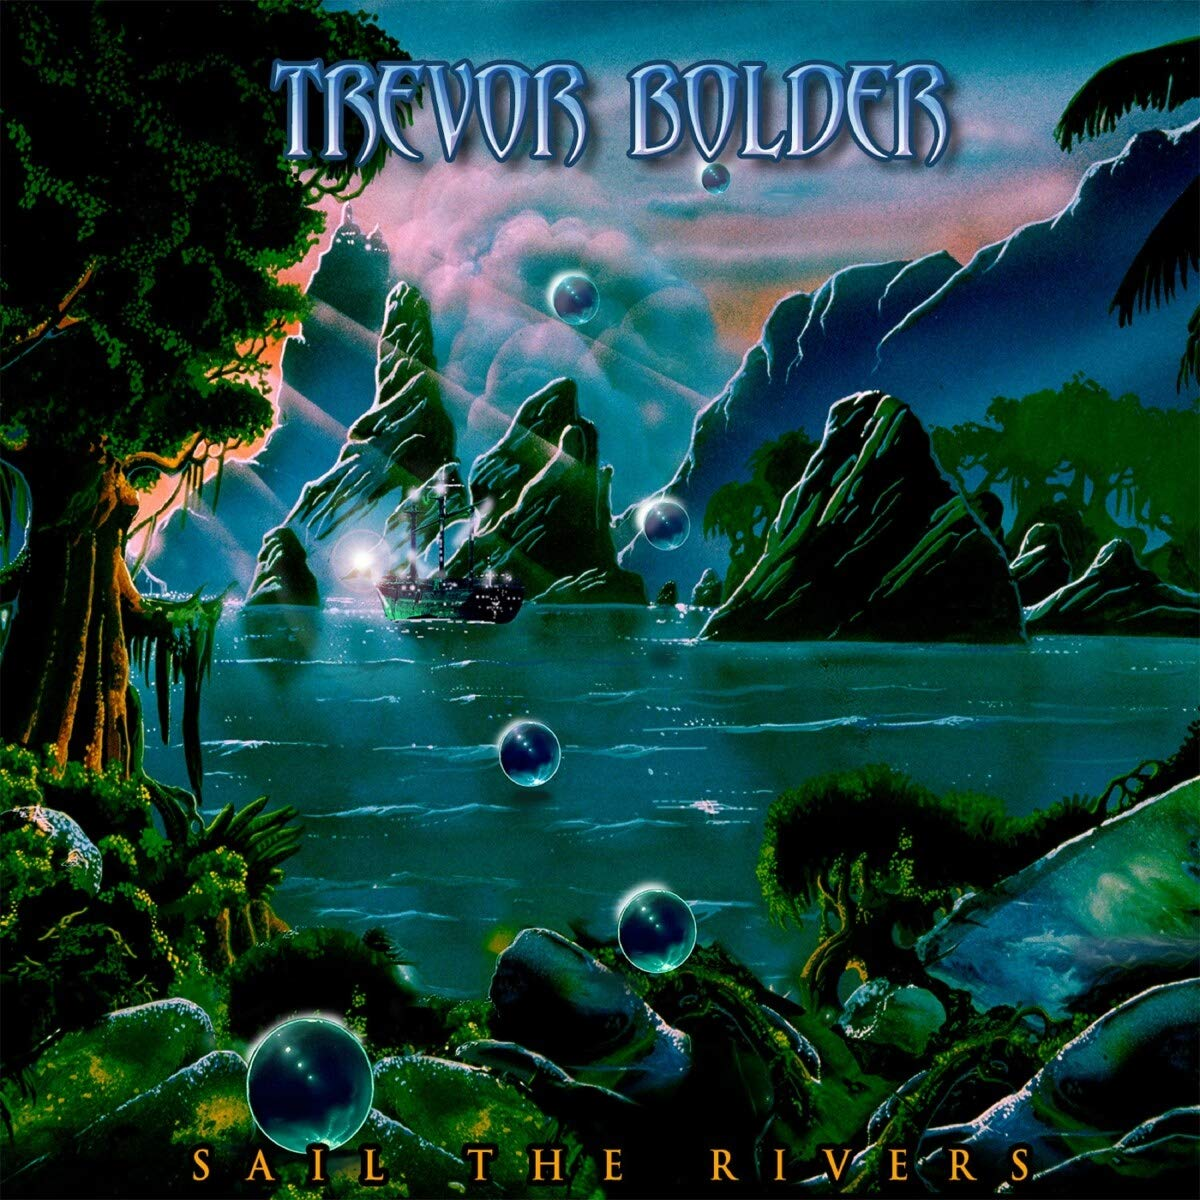 Trevor Bolder – Sail The Rivers (2020) [FLAC]